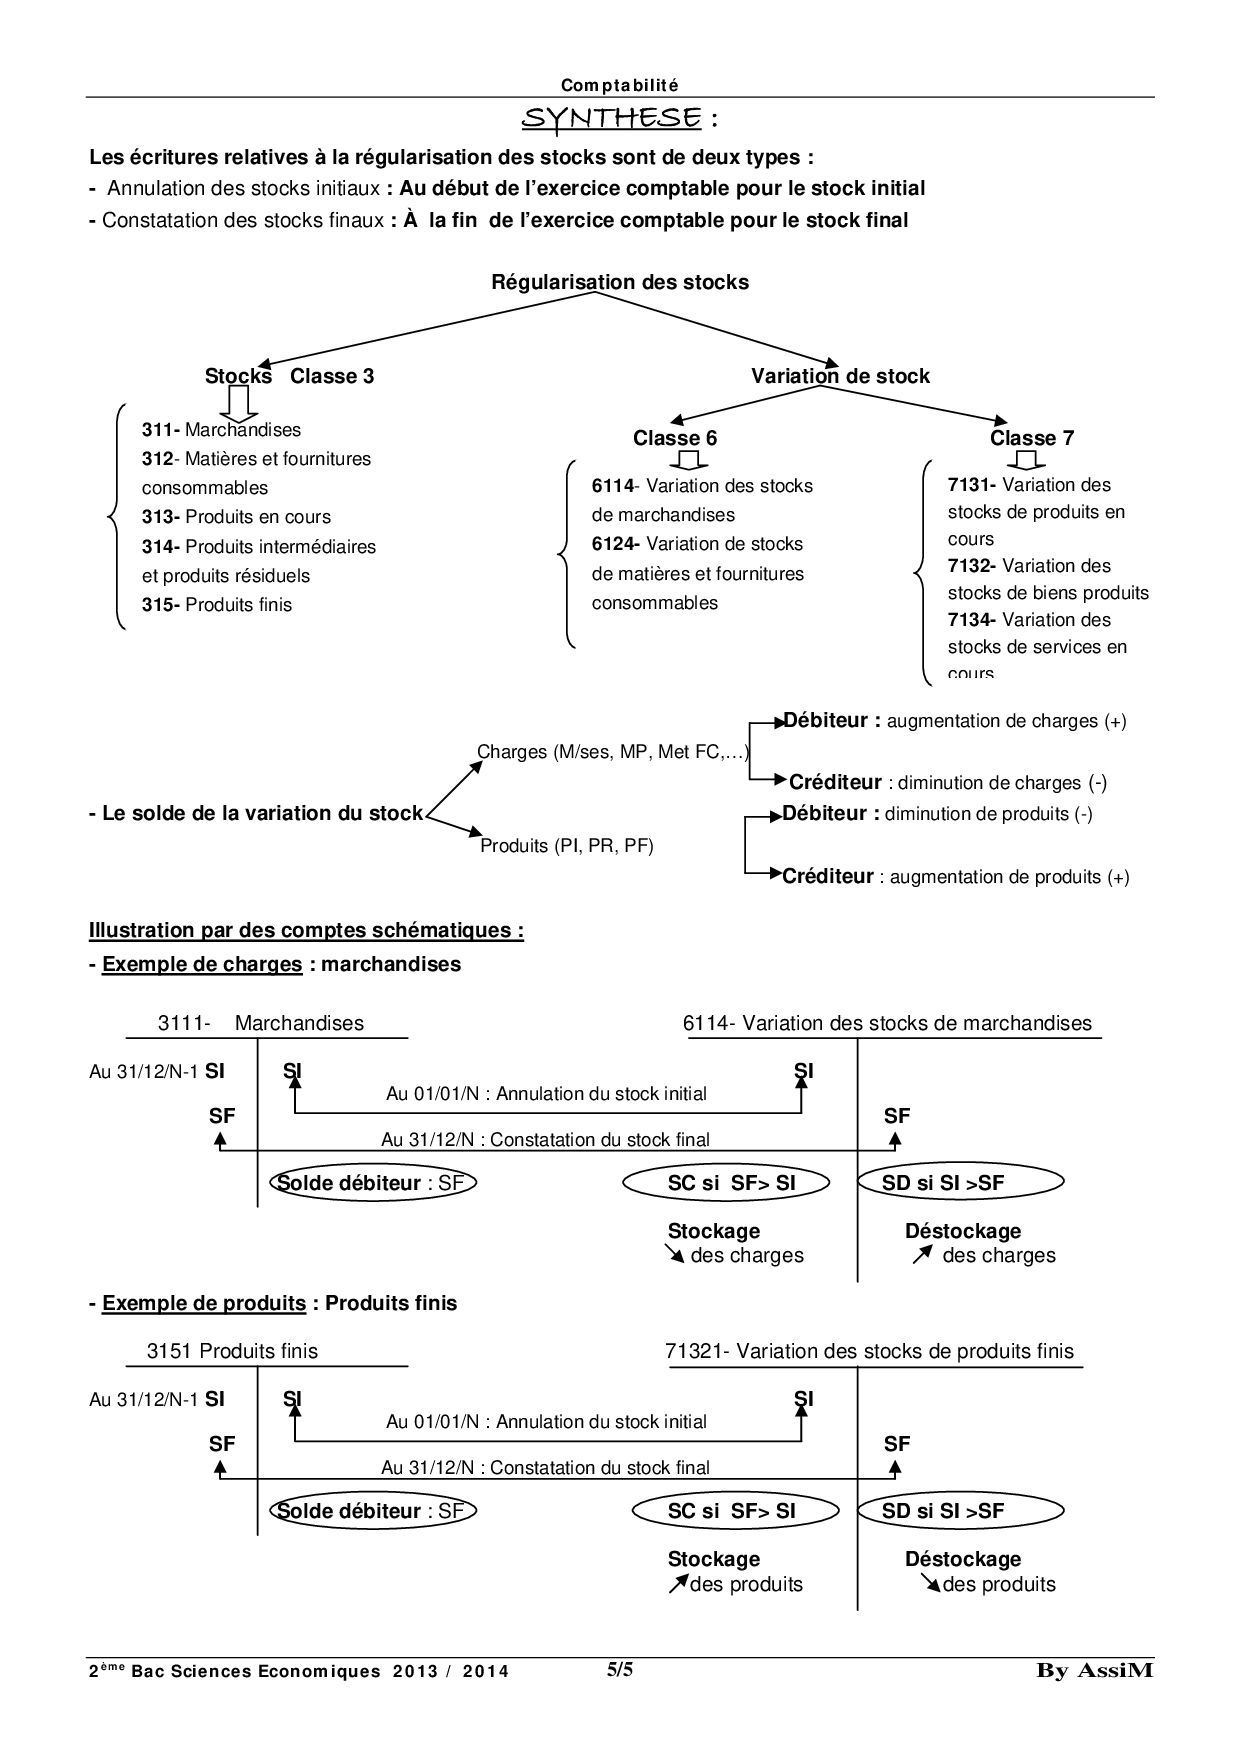 2 La Regularisation Des Stocks Alloschool Mathematiques Financieres Regularisation Exercice Comptable